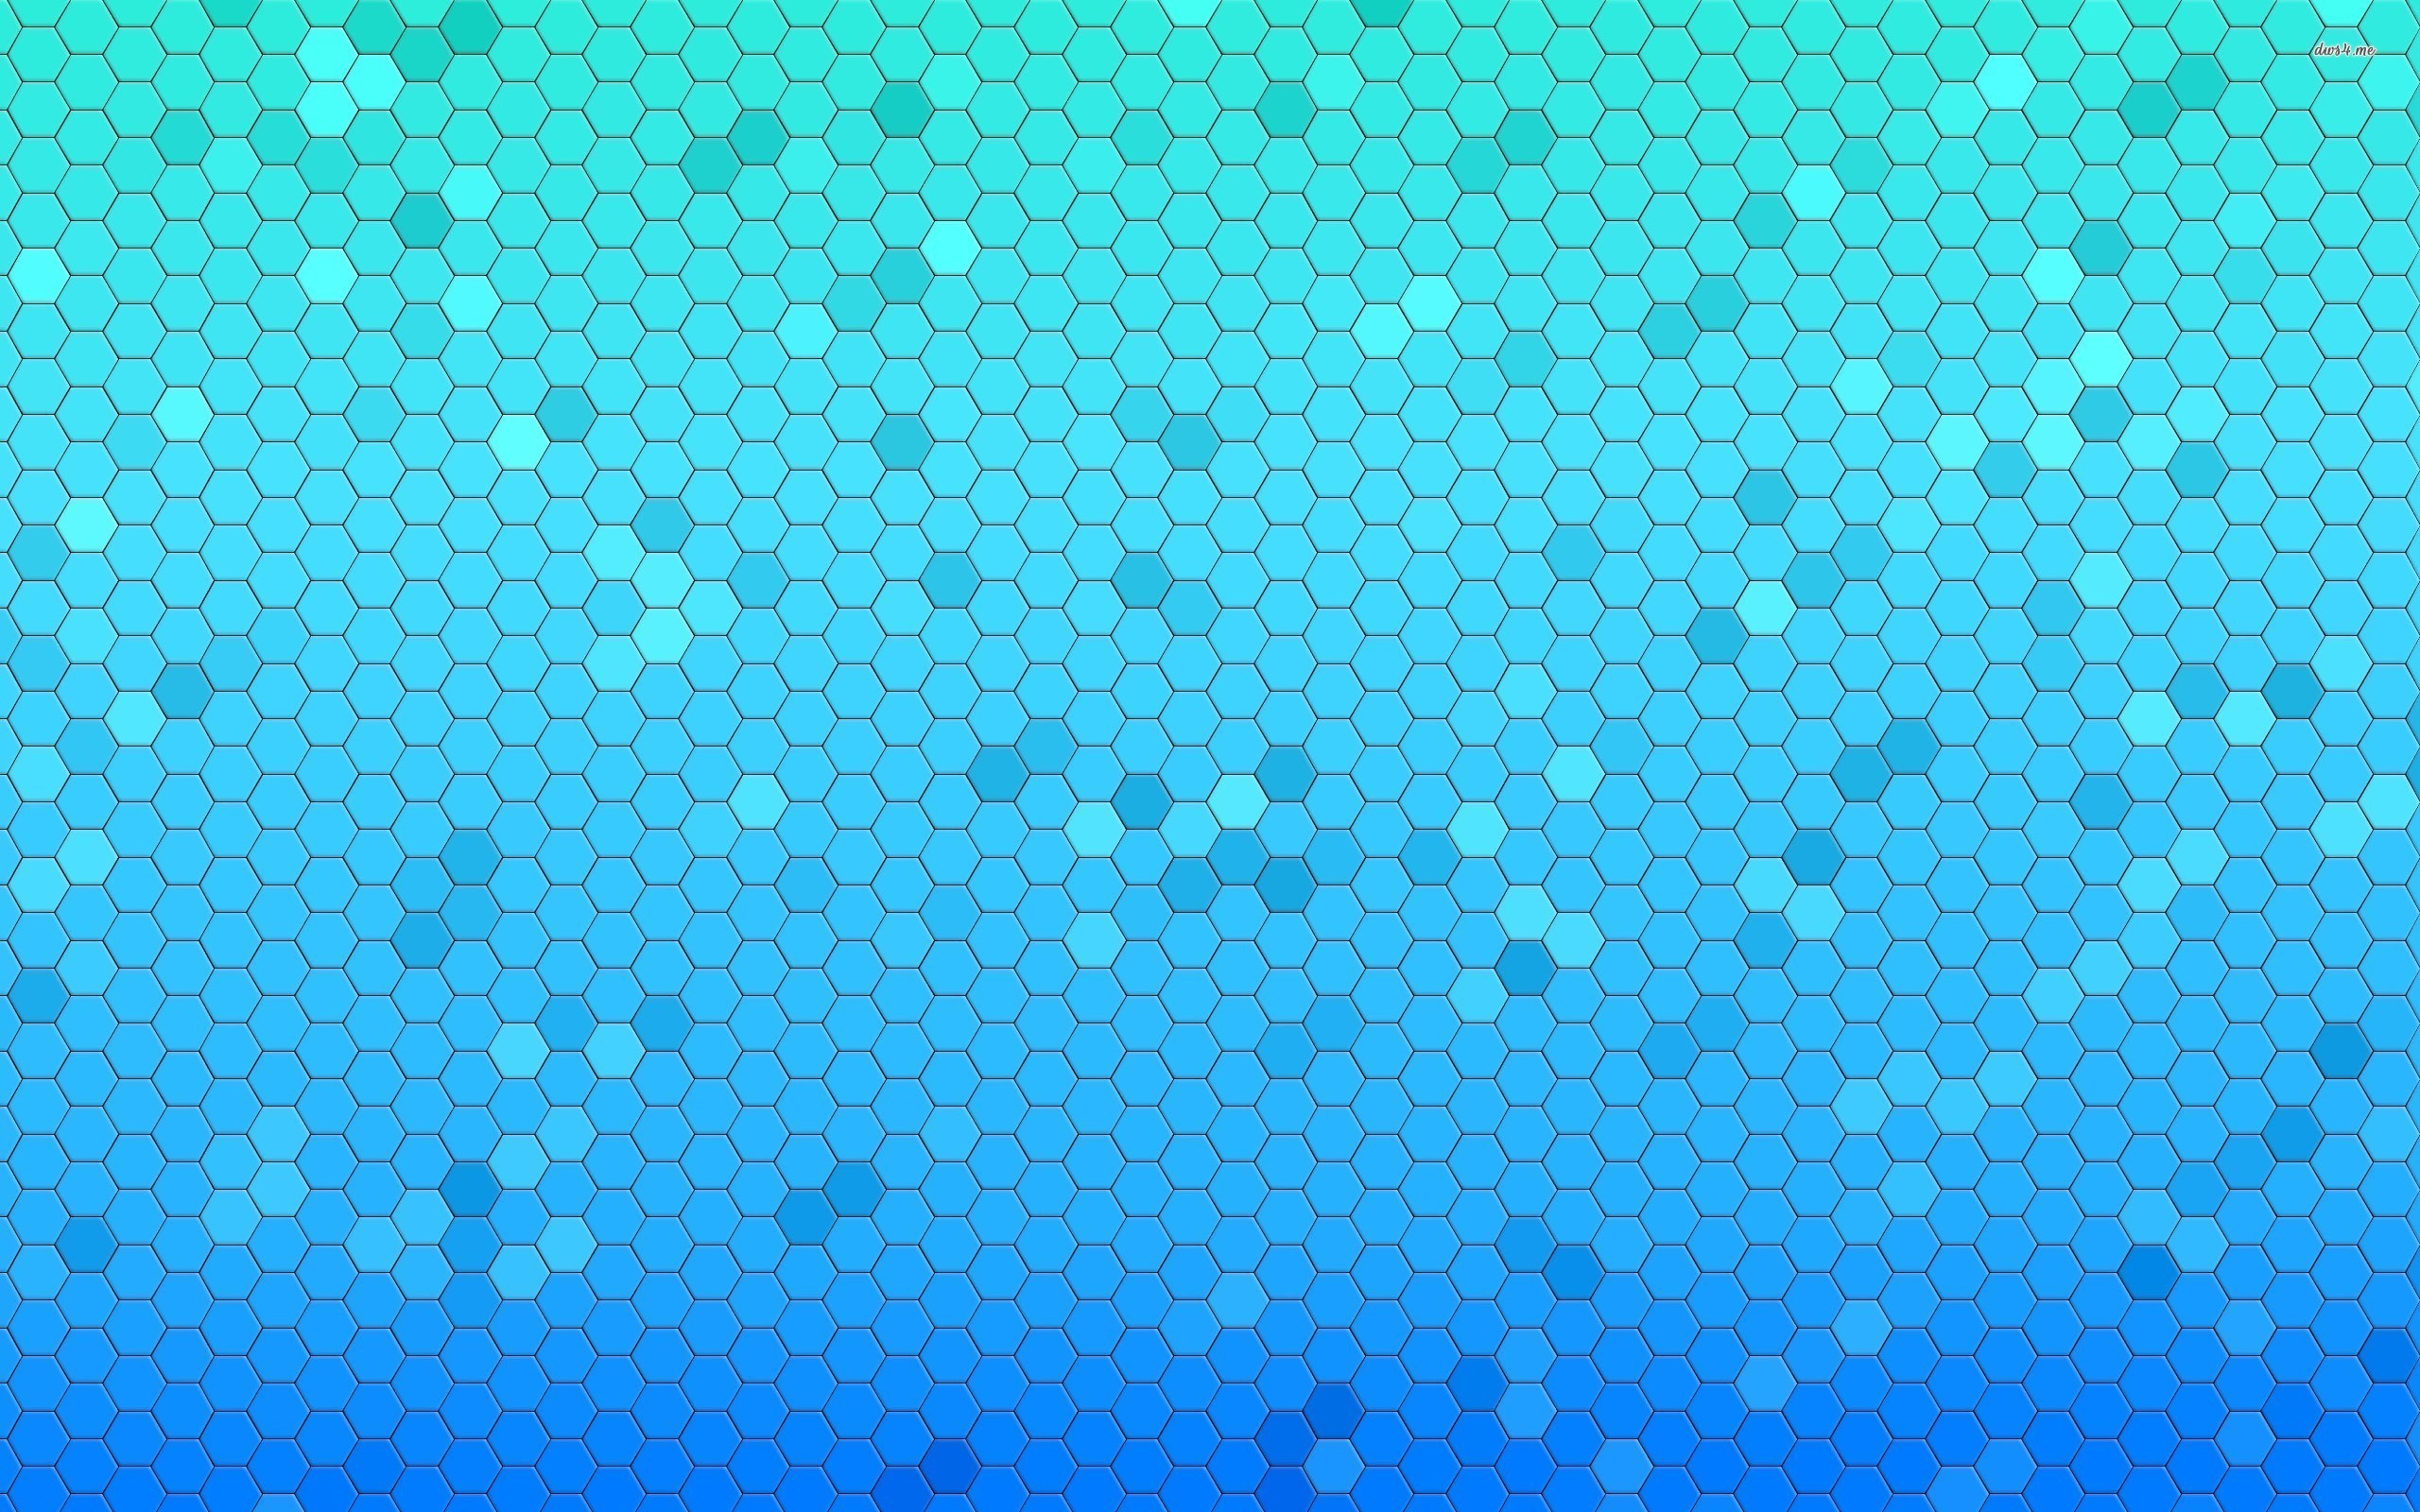 15437-blue-honeycomb-pattern-2560×1600-abstract-wallpaper